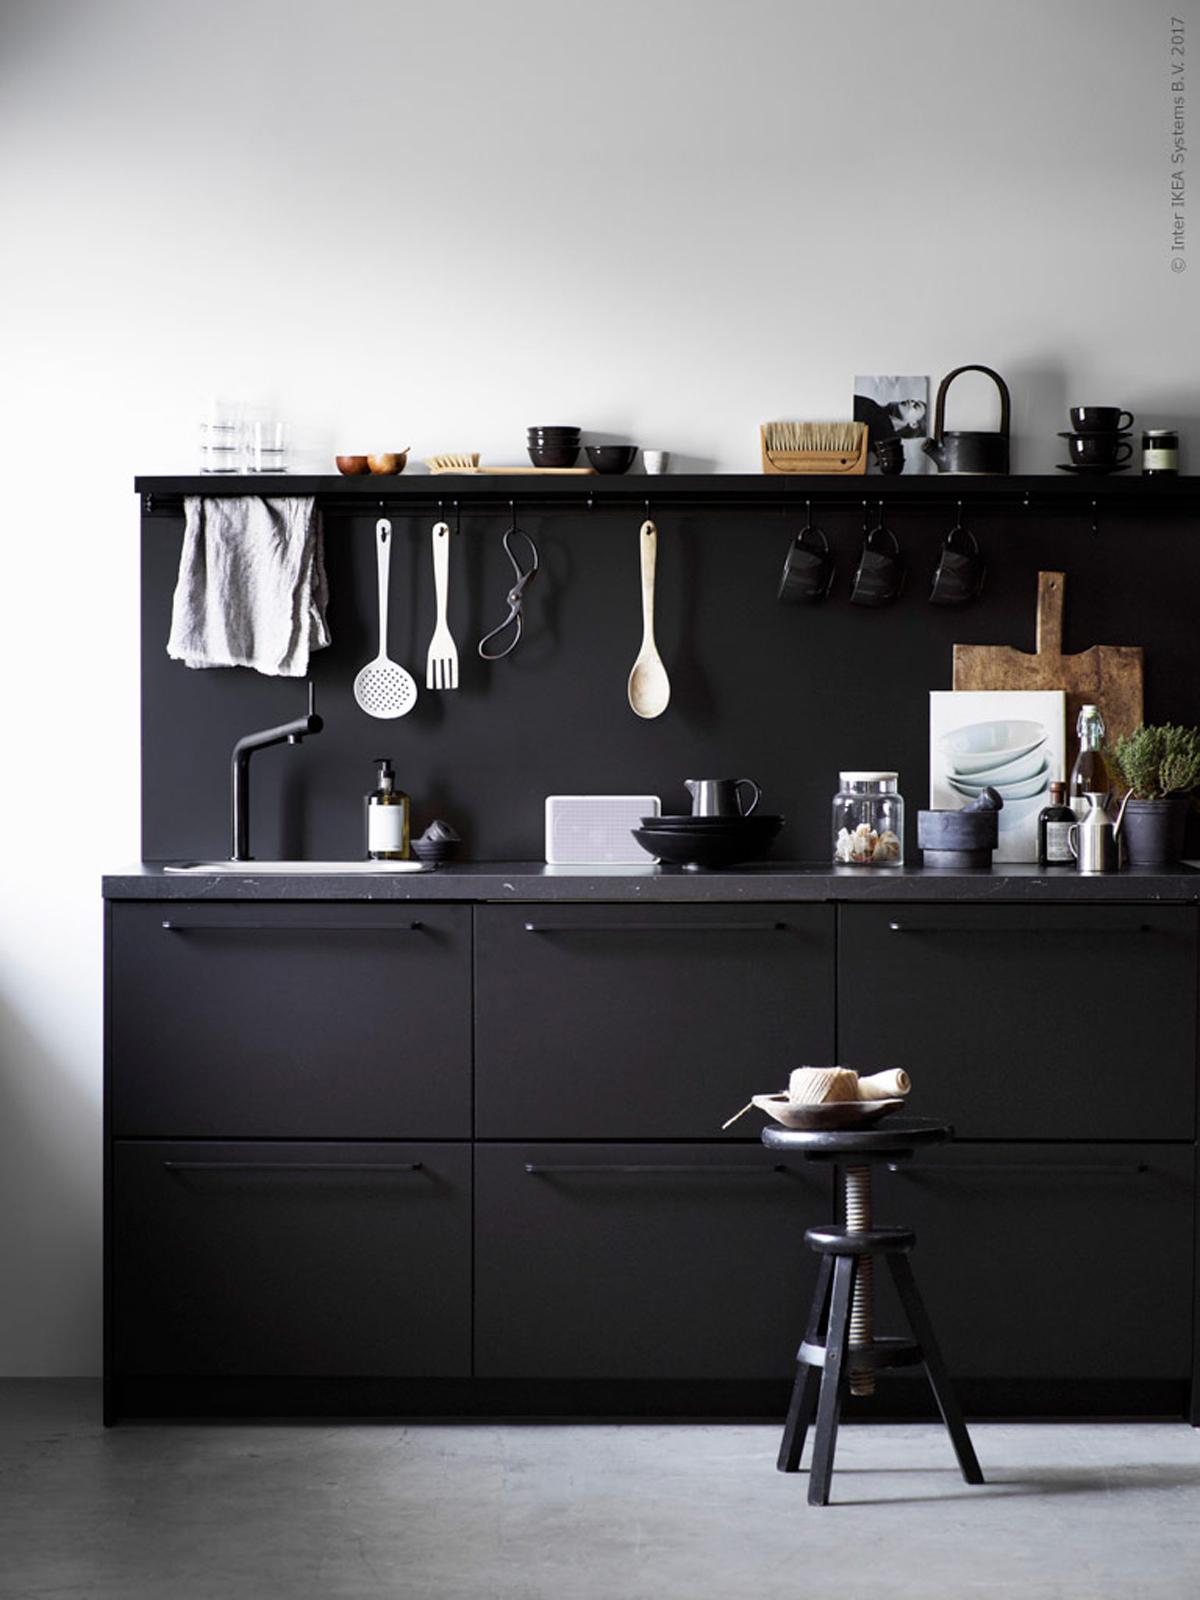 Rubinetti neri per la cucina - Rubinetti x cucina ...